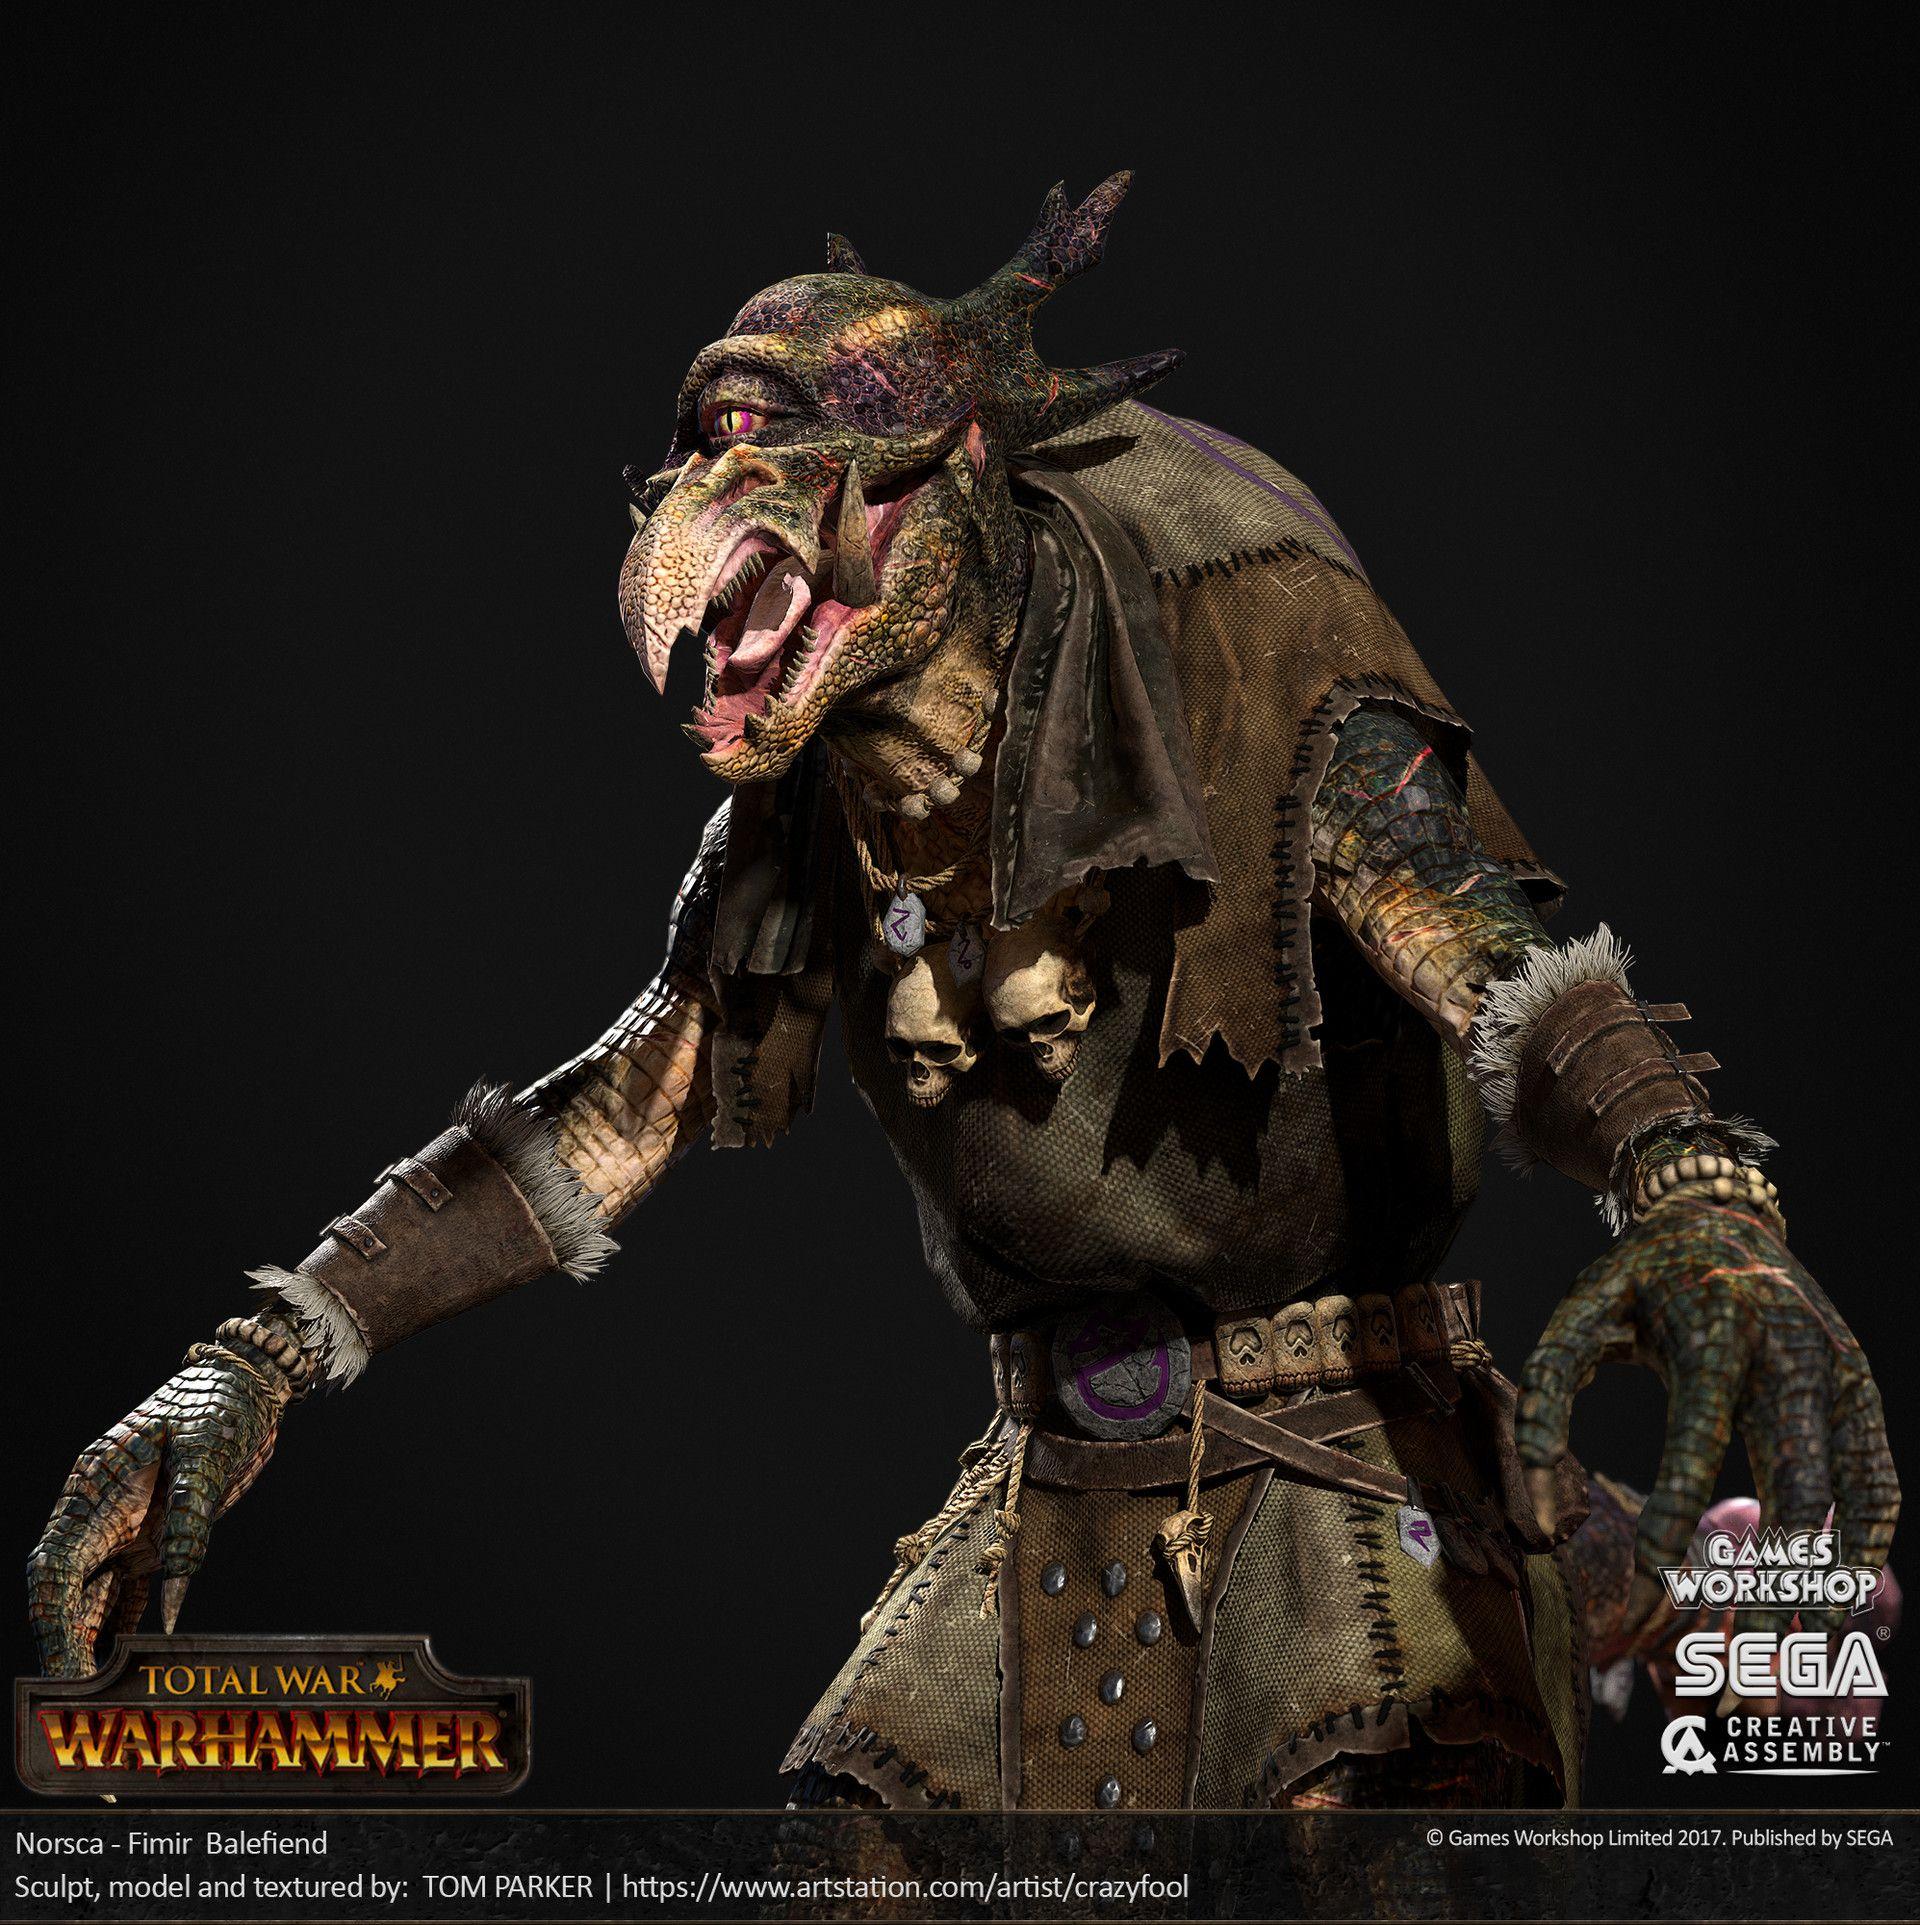 Total War : Warhammer - Page 5 08d649d6d6c5e6125de26a9253d3cf1b